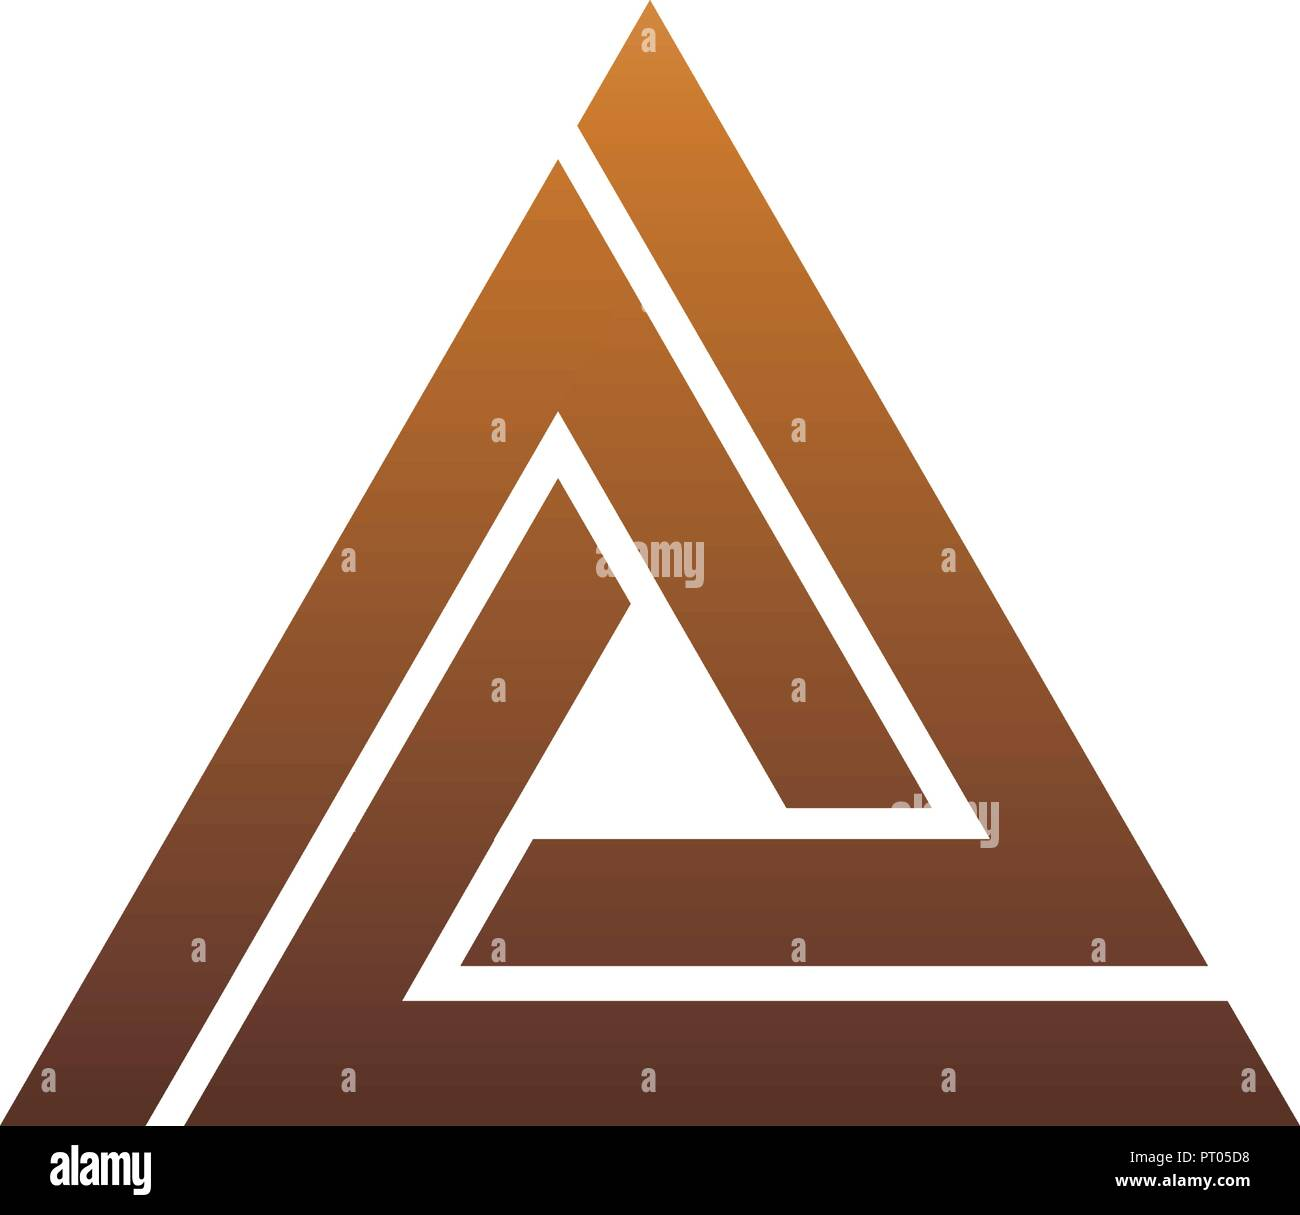 Luxury Letter A Logo Triangle Logo Design Concept Template Stock Vector Image Art Alamy